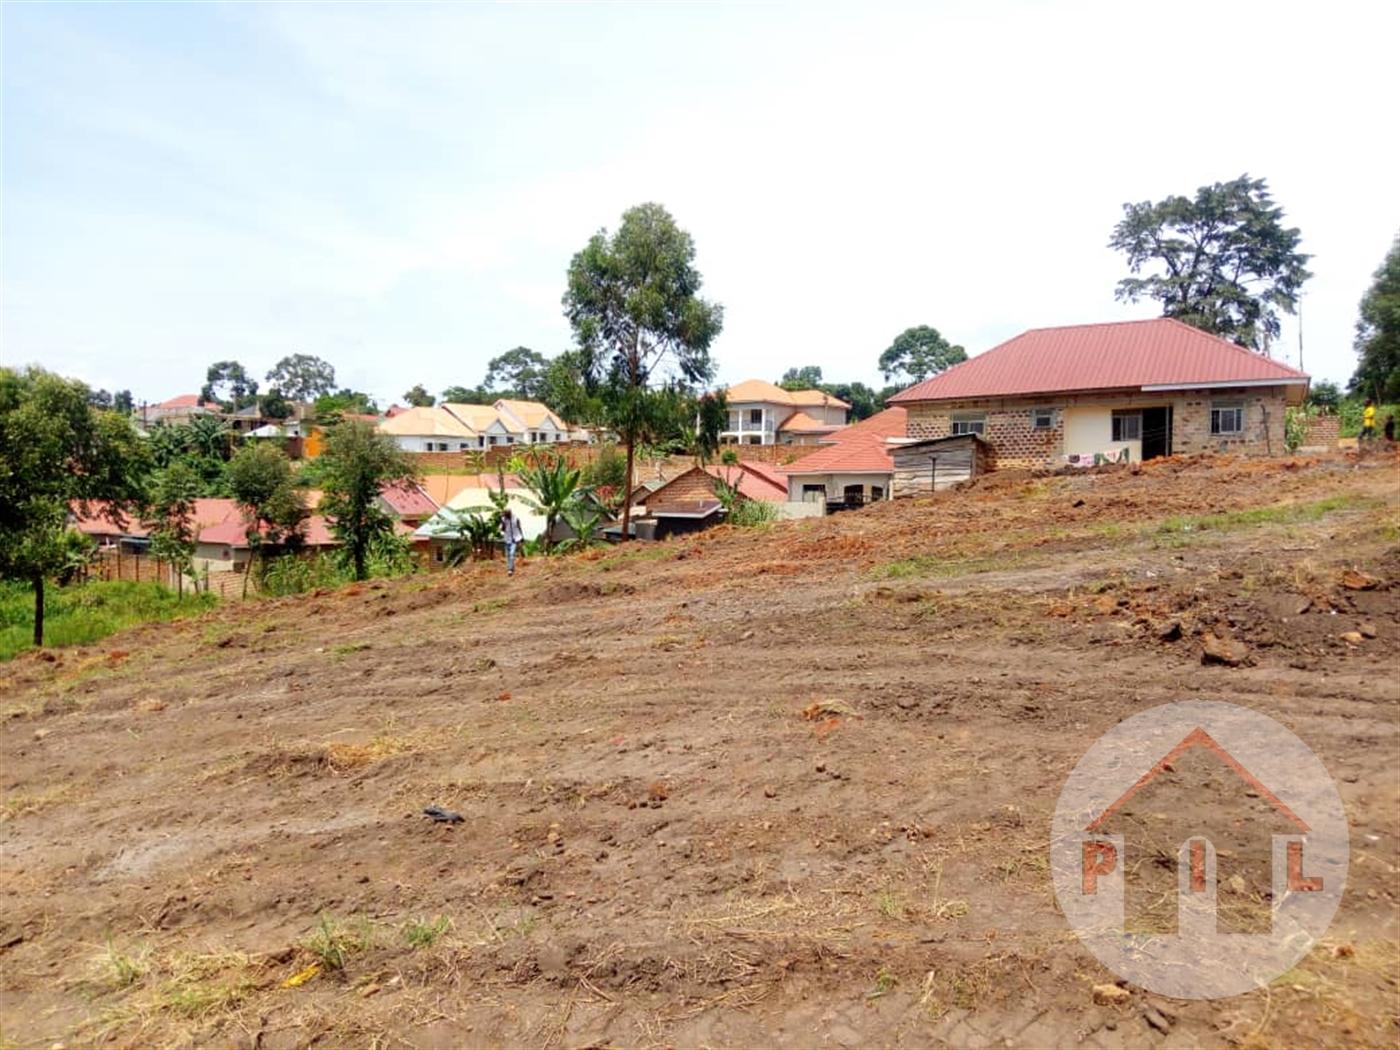 Residential Land for sale in Ruti Mbarara